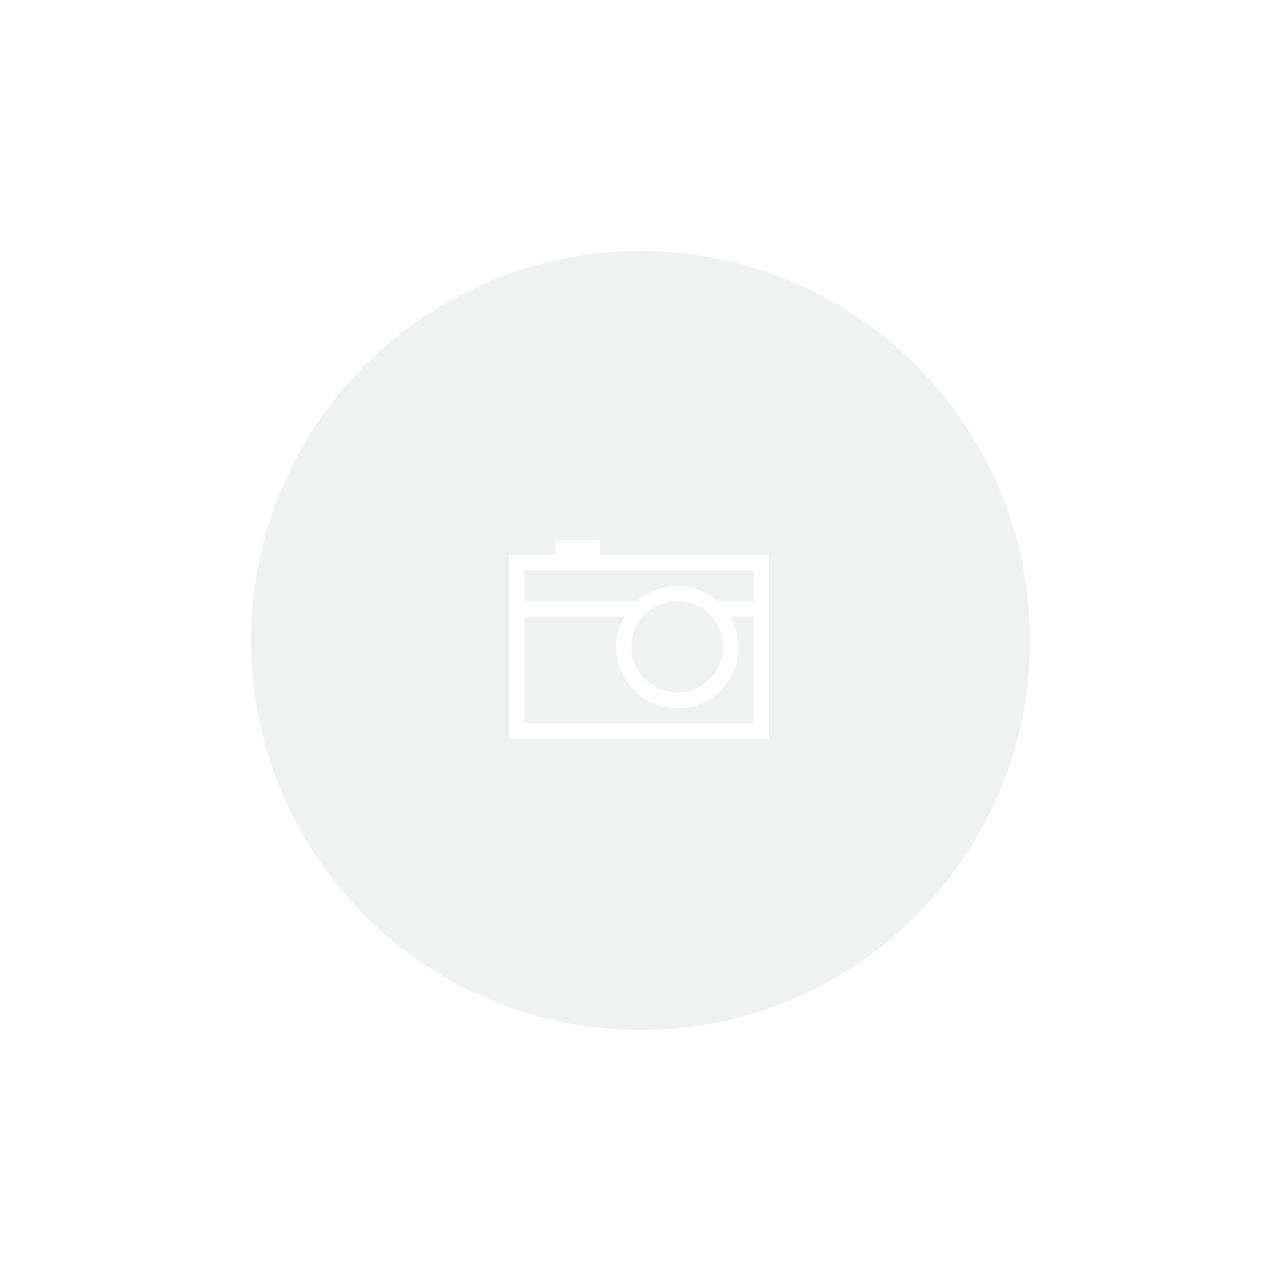 TRANSBIKE THULE EURO RIDE ENGATE REBOQUE 2 BIKES (941005)